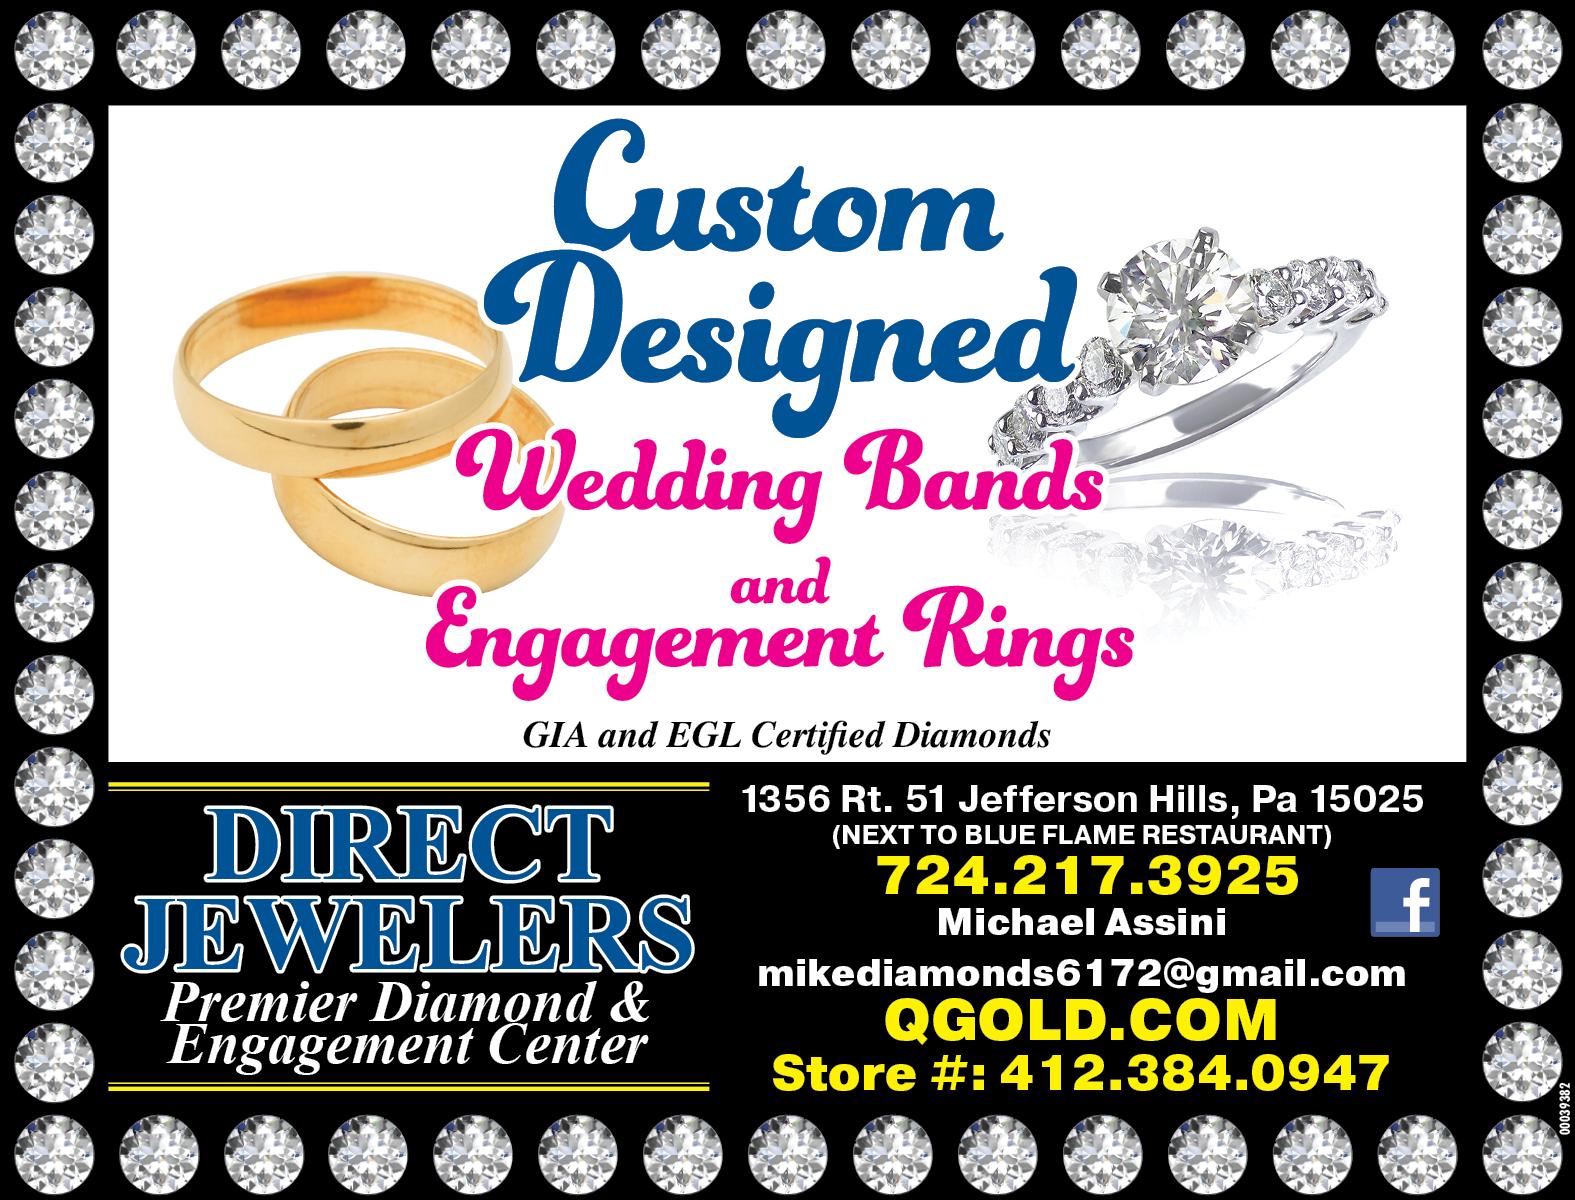 00040584_Direct Jewelry_3x4